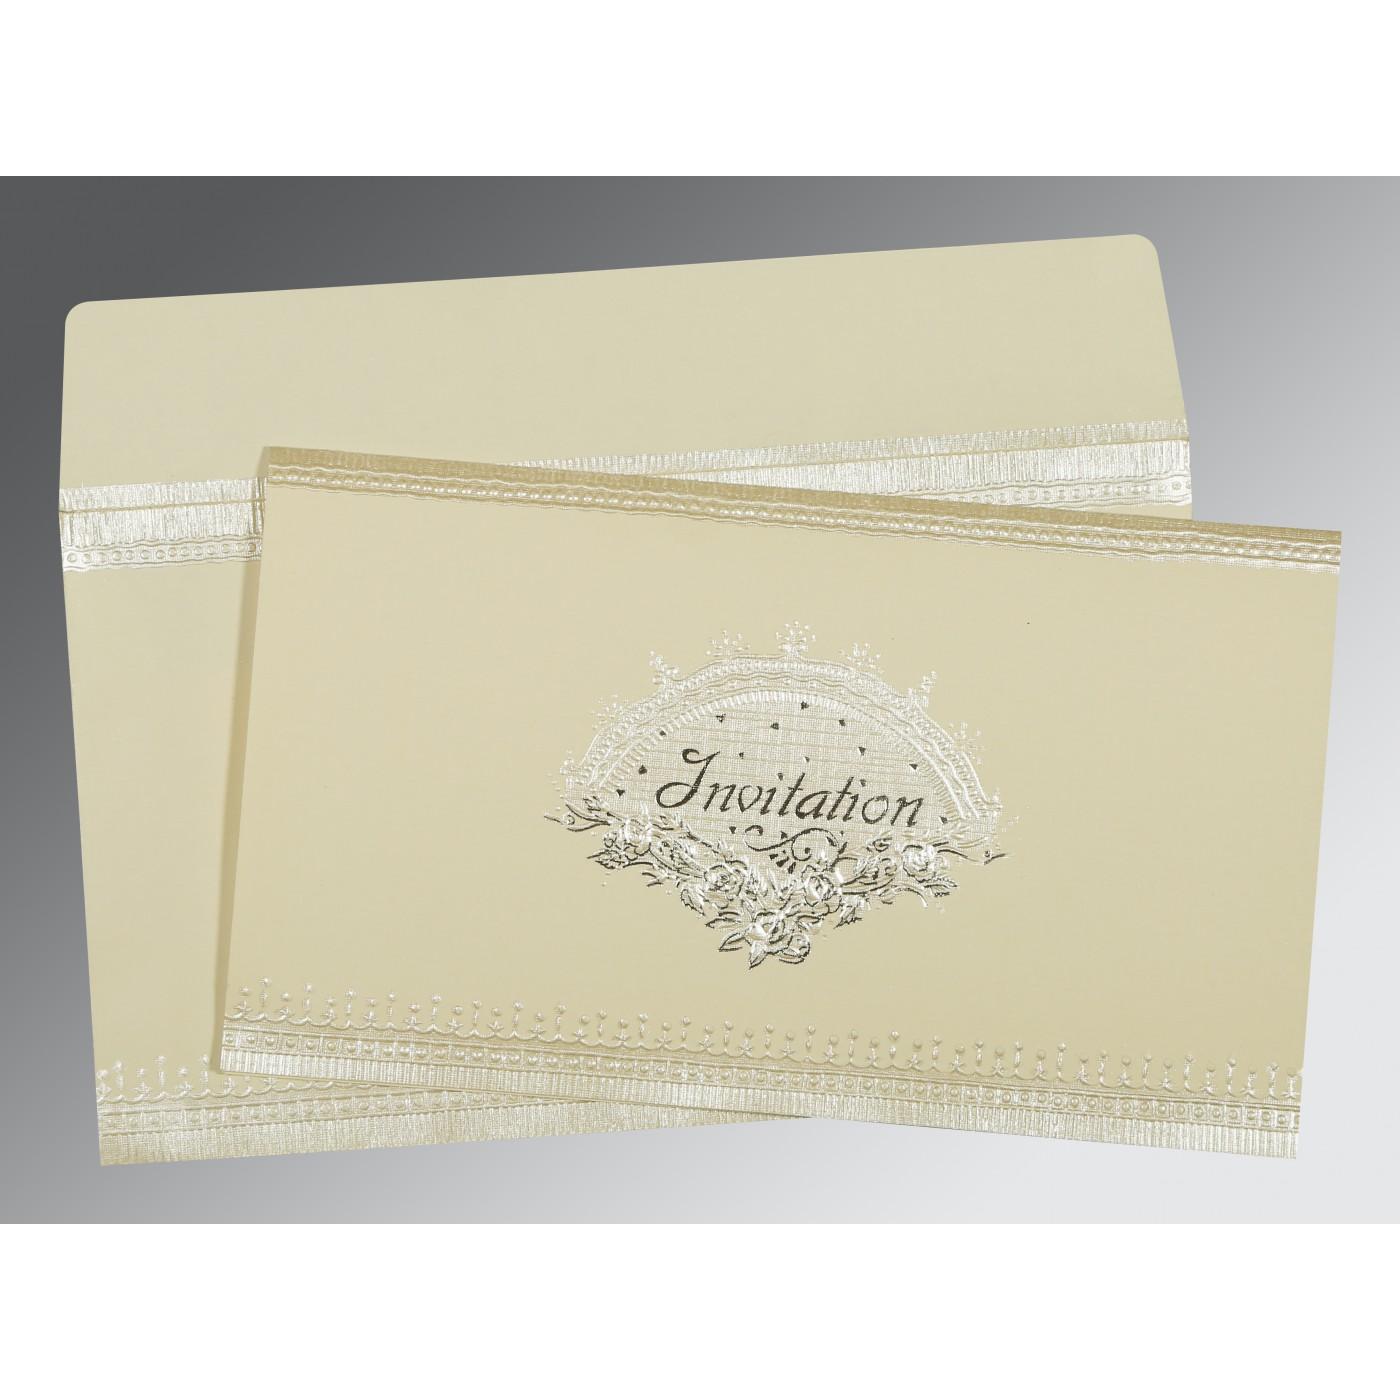 OFF-WHITE MATTE FOIL STAMPED WEDDING INVITATION : C-1338 - 123WeddingCards